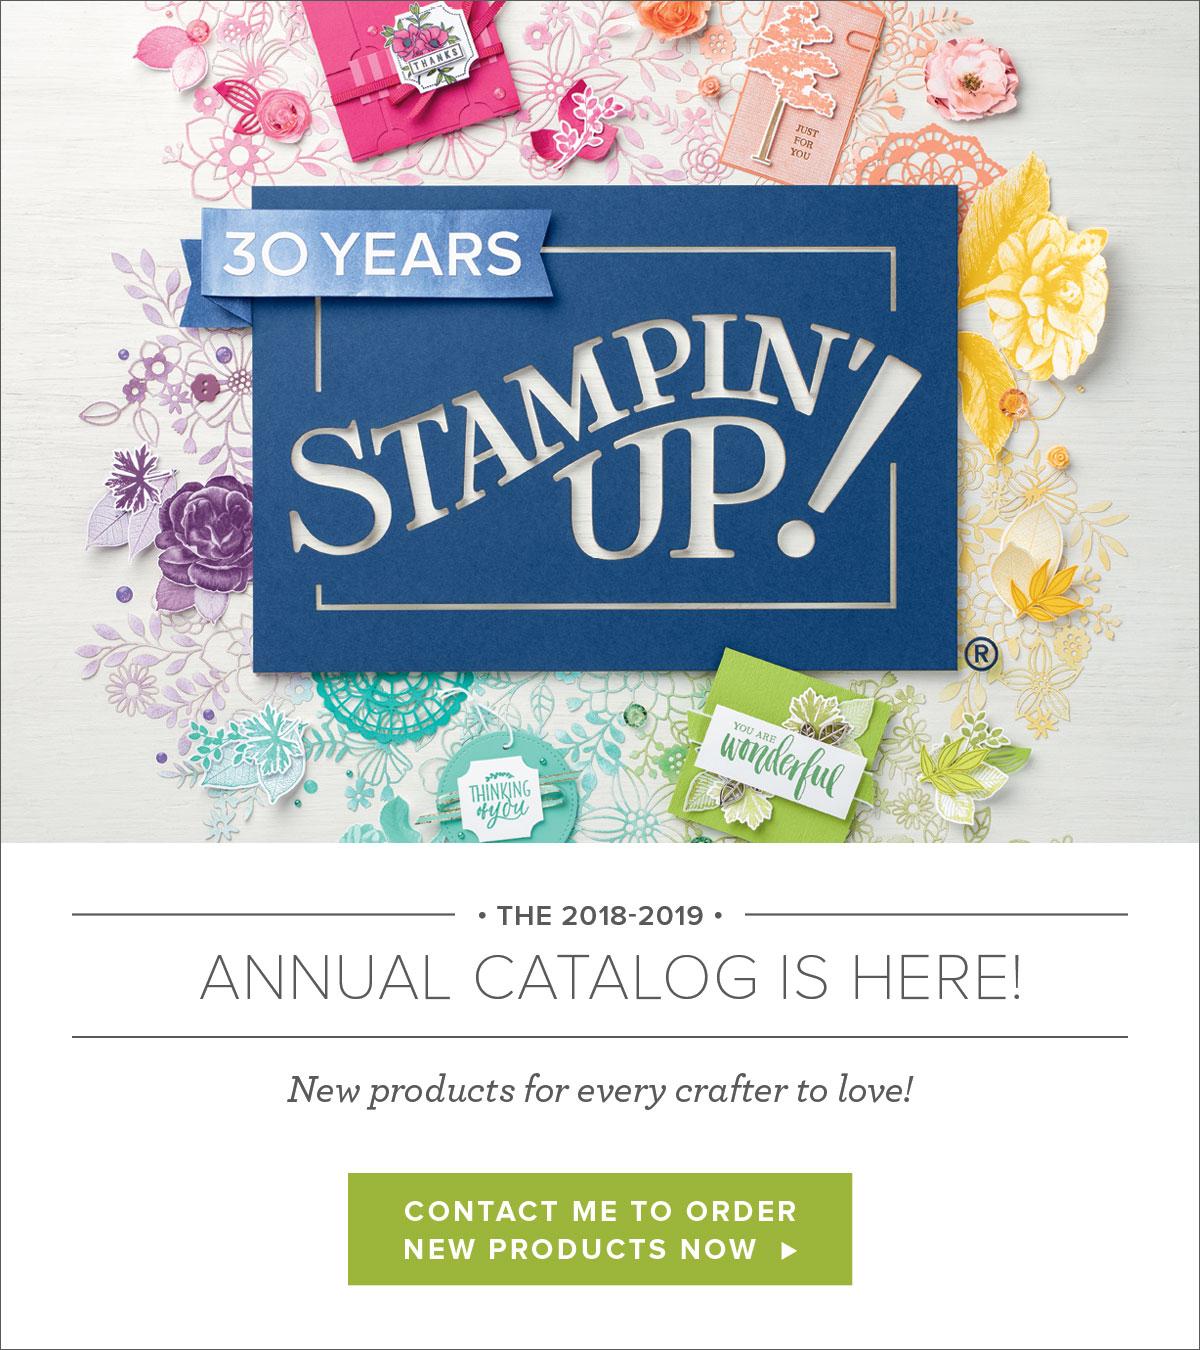 2018-19 Annual Catalog